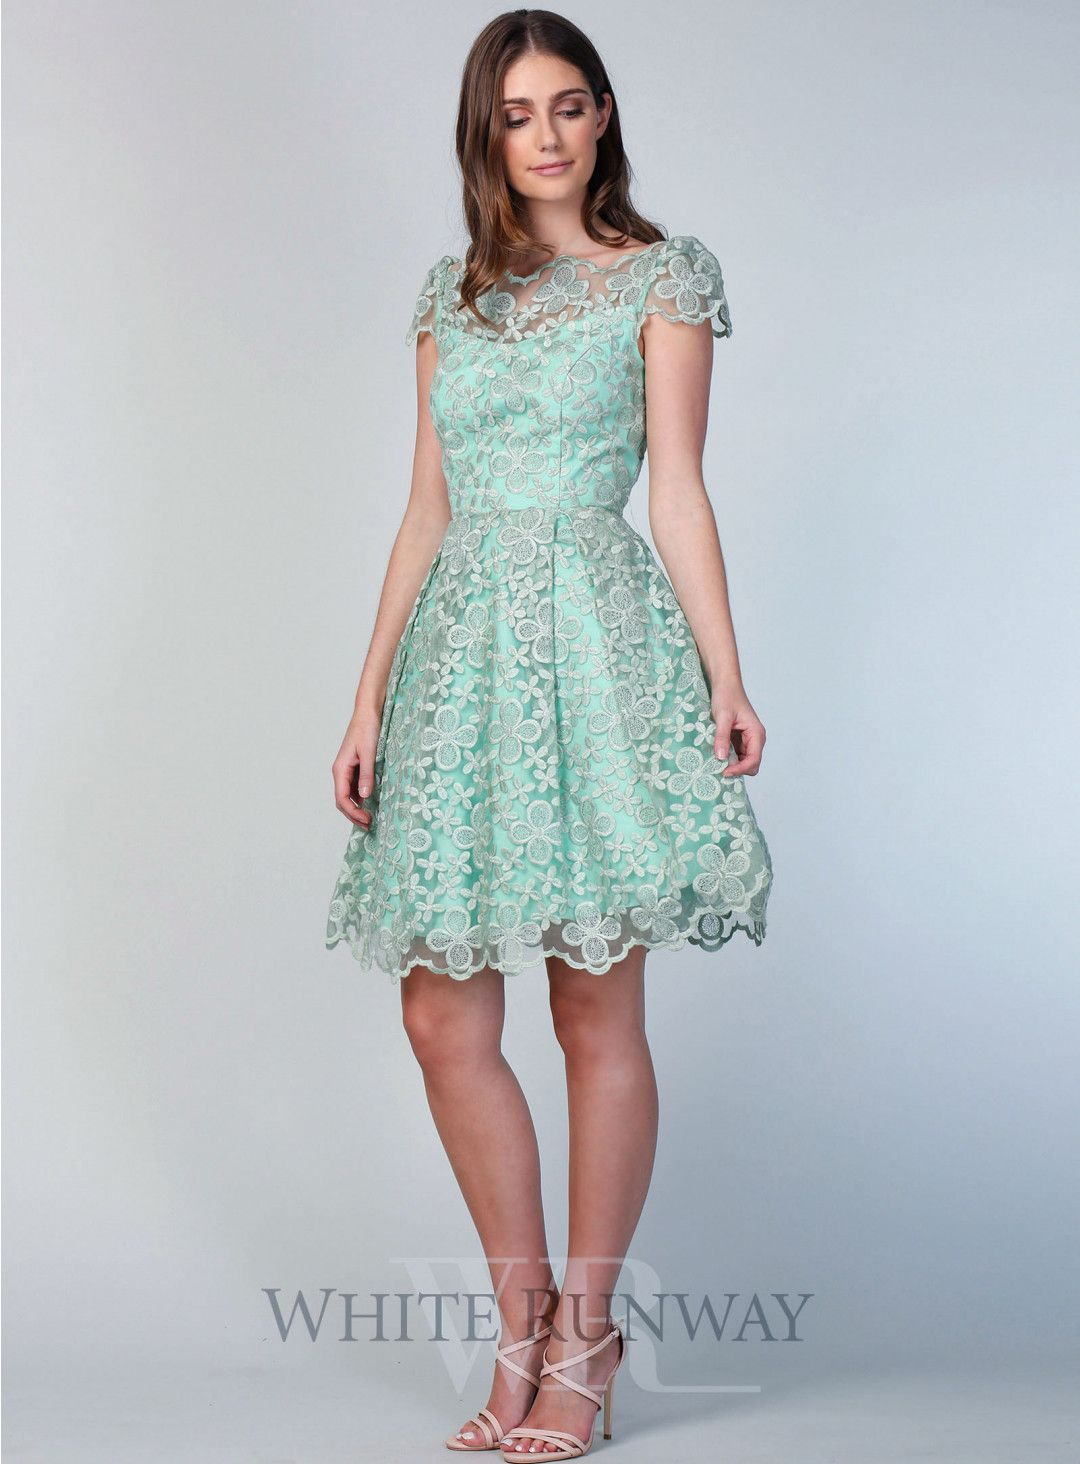 Elizabeth Dress | Lace bridesmaids, Wedding and Themed weddings